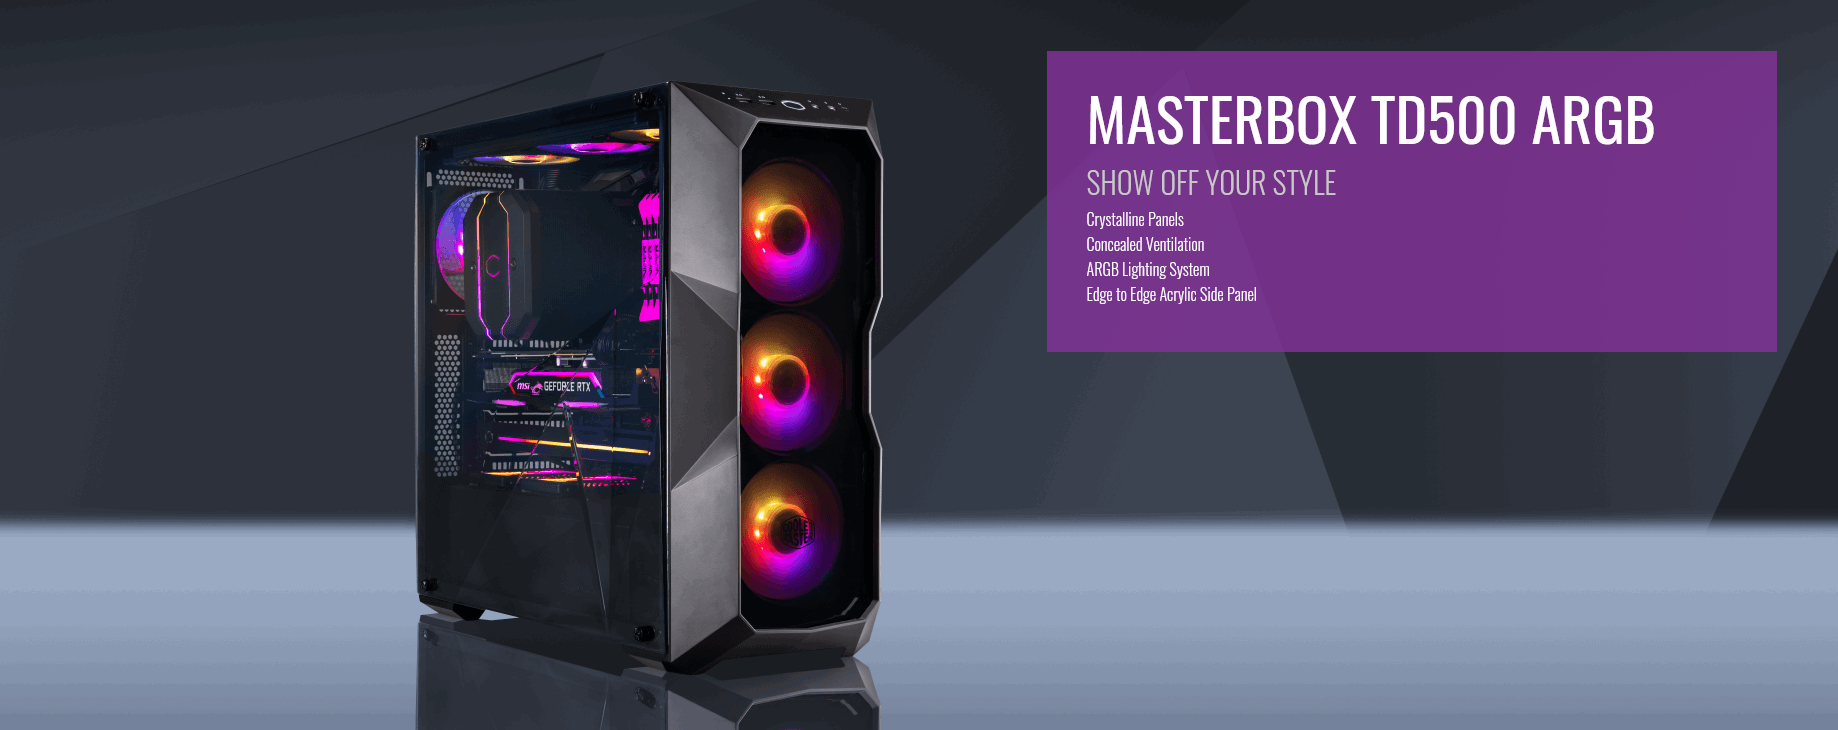 Case Cooler Master MasterBox TD500 ARGB (Mid Tower/Màu đen/Led ARGB) giới thiệu 2